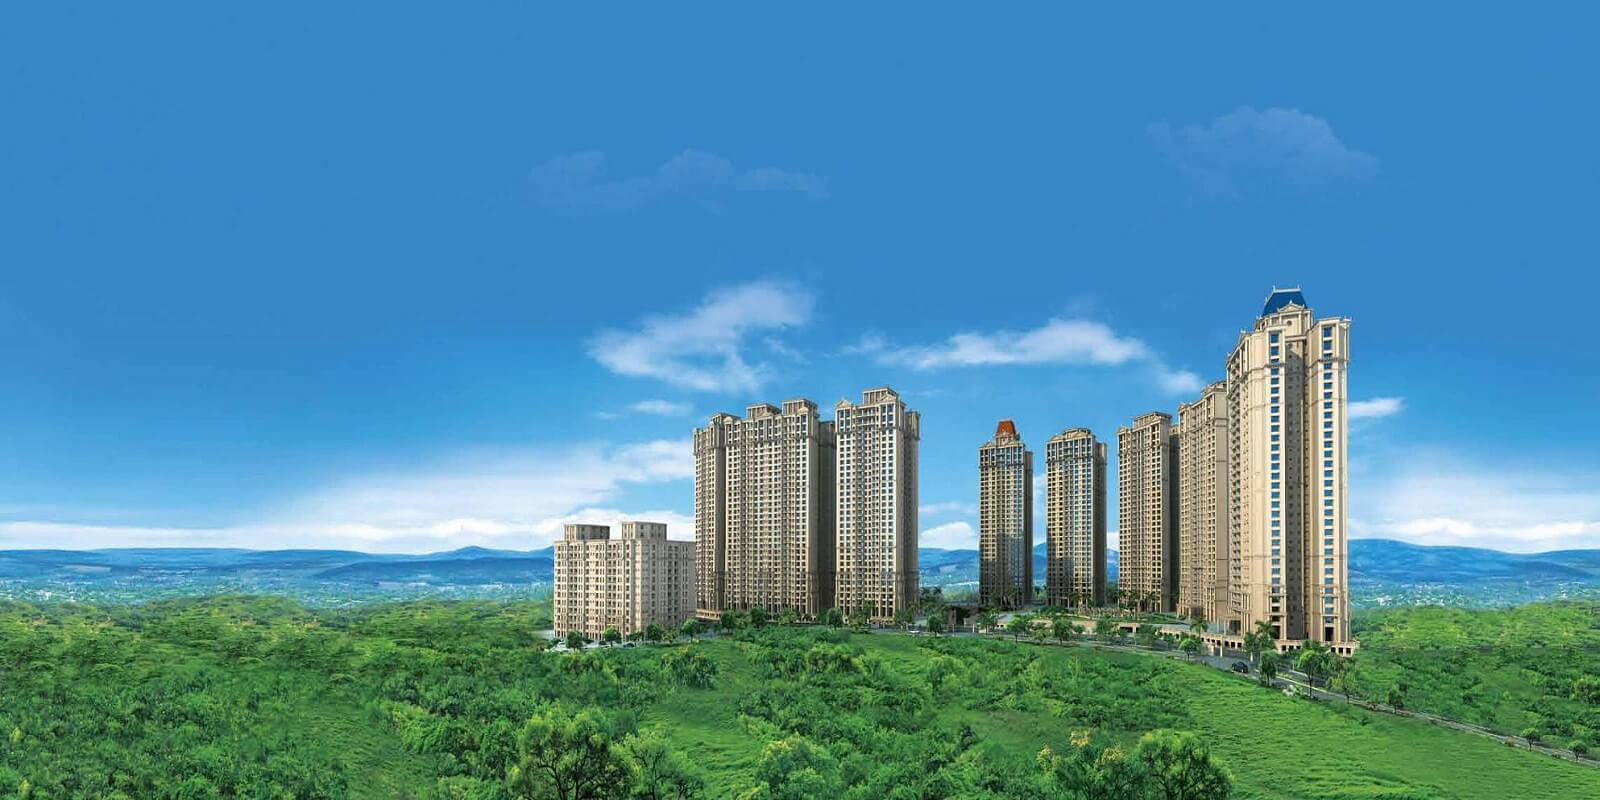 hiranandani fortune city project large image1